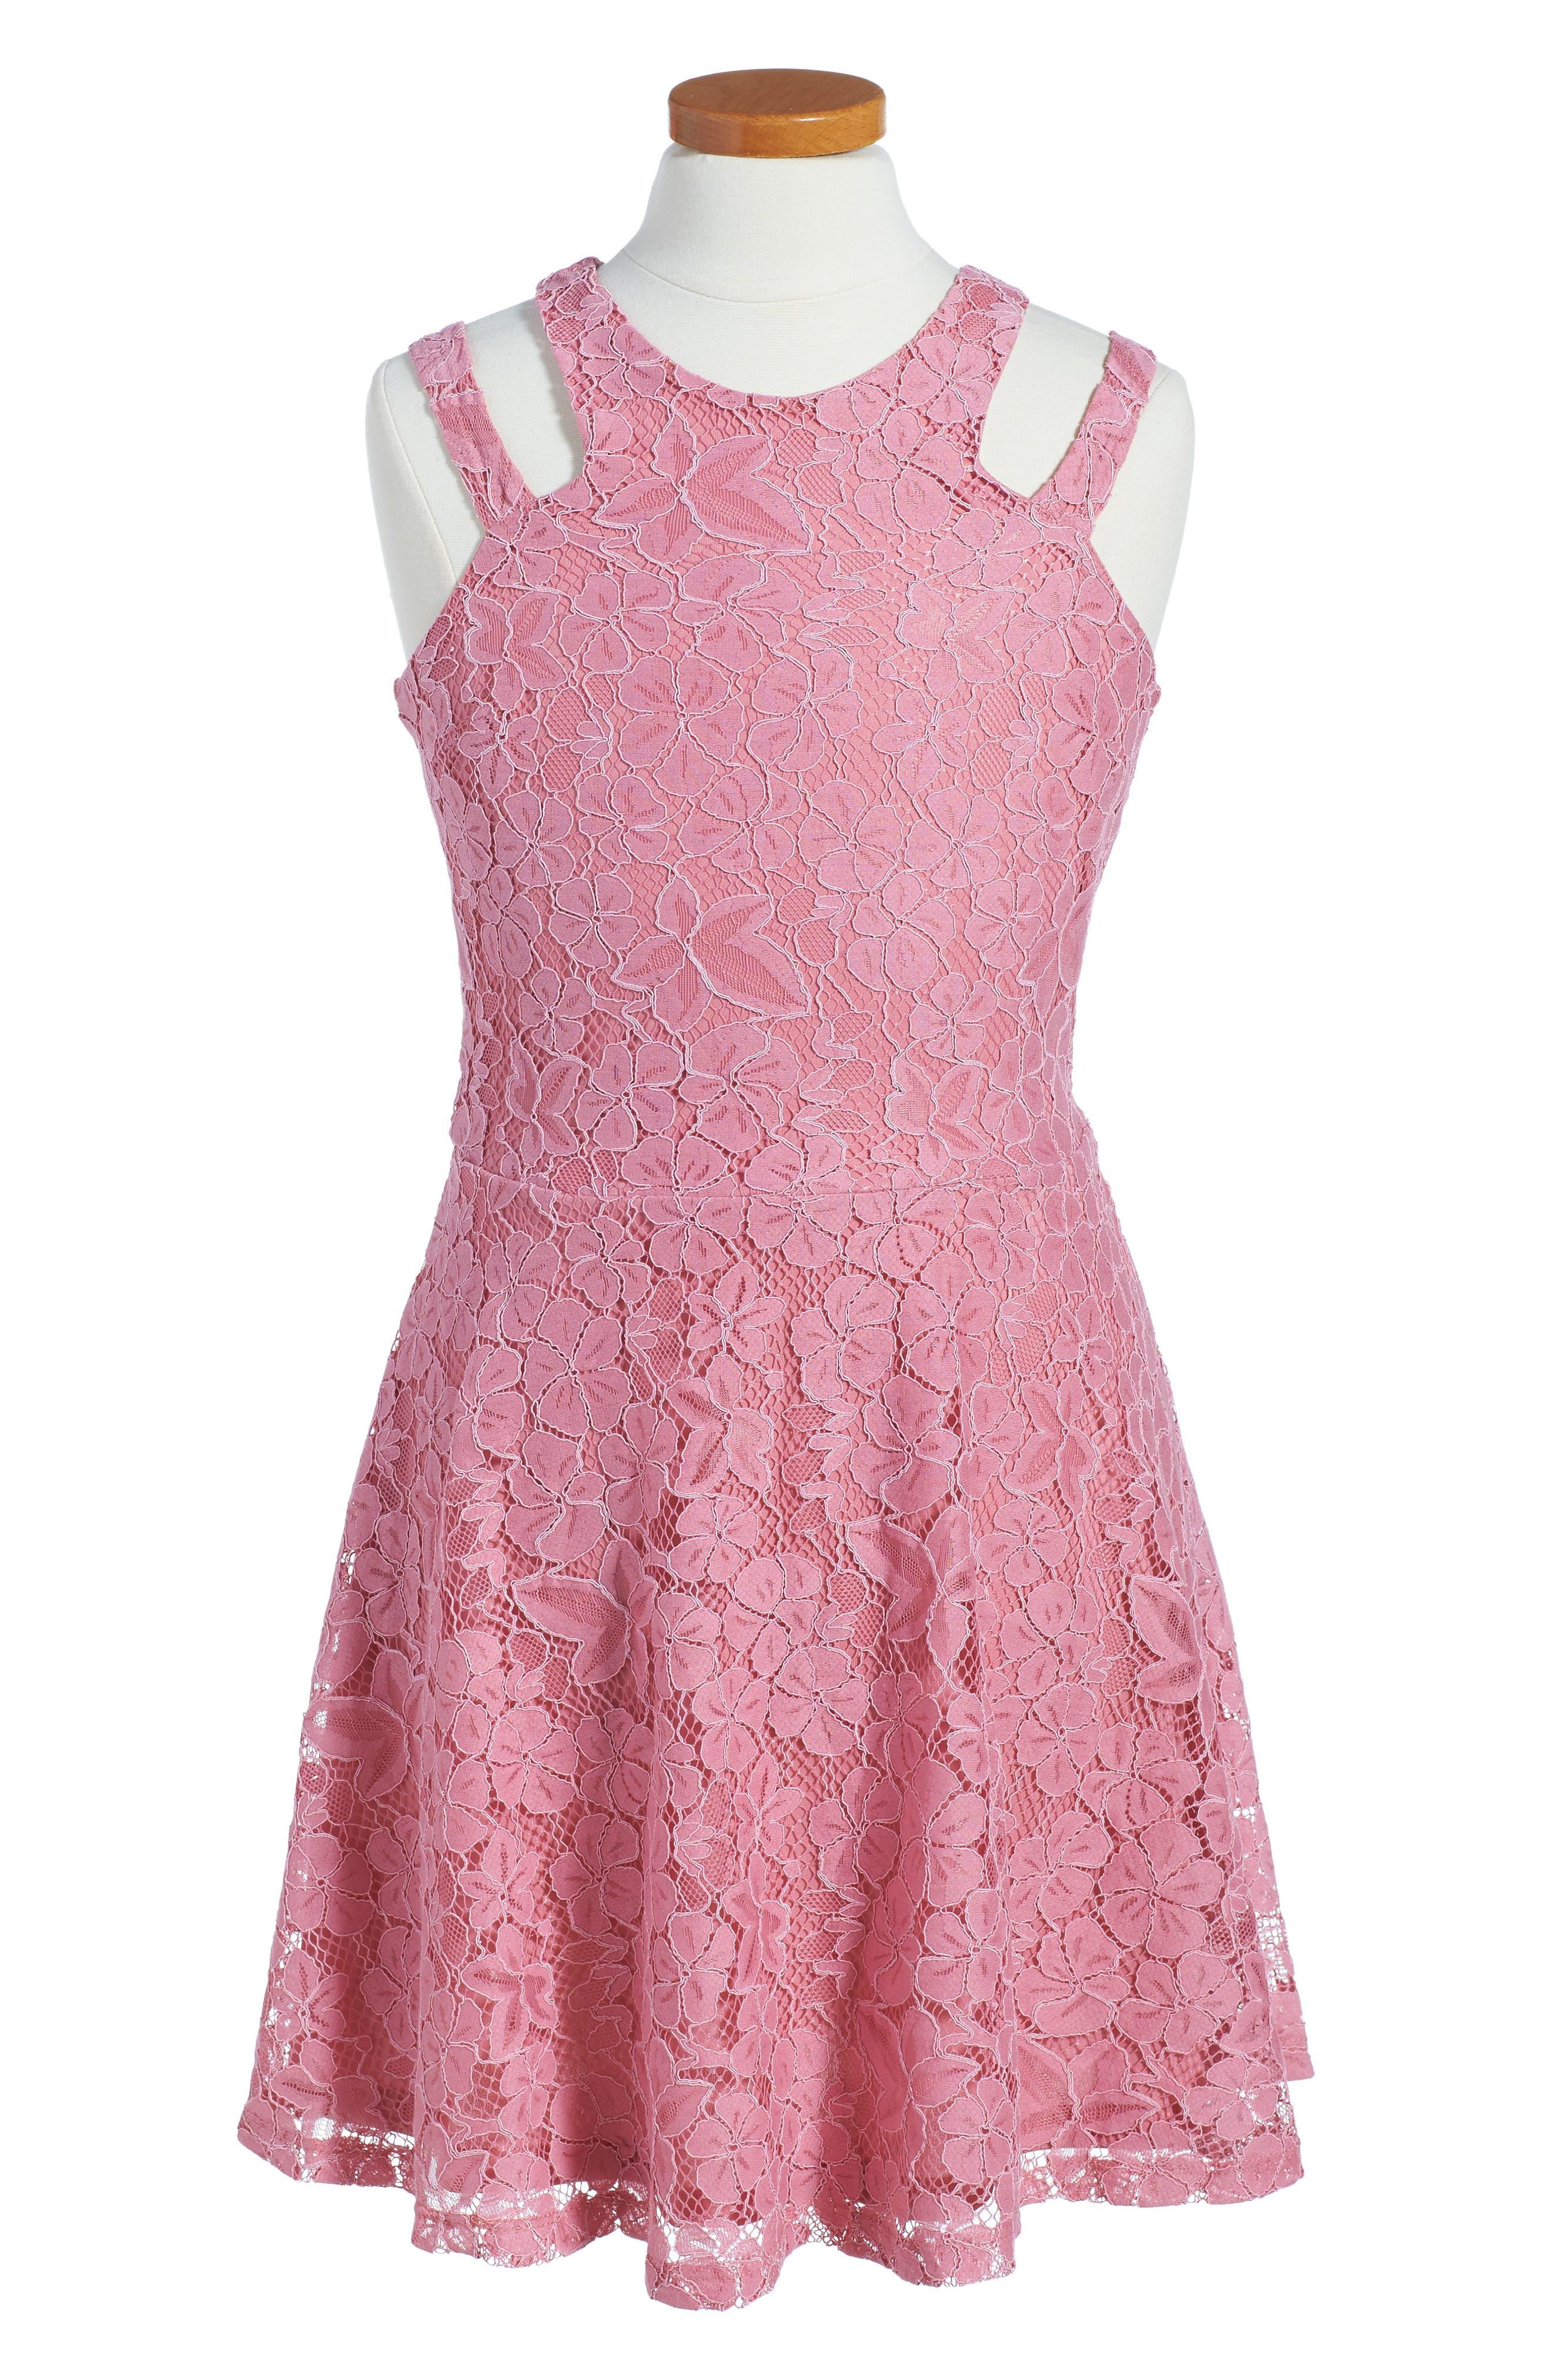 Penelope Tree Lace Sleeveless Dress (Big Girls)